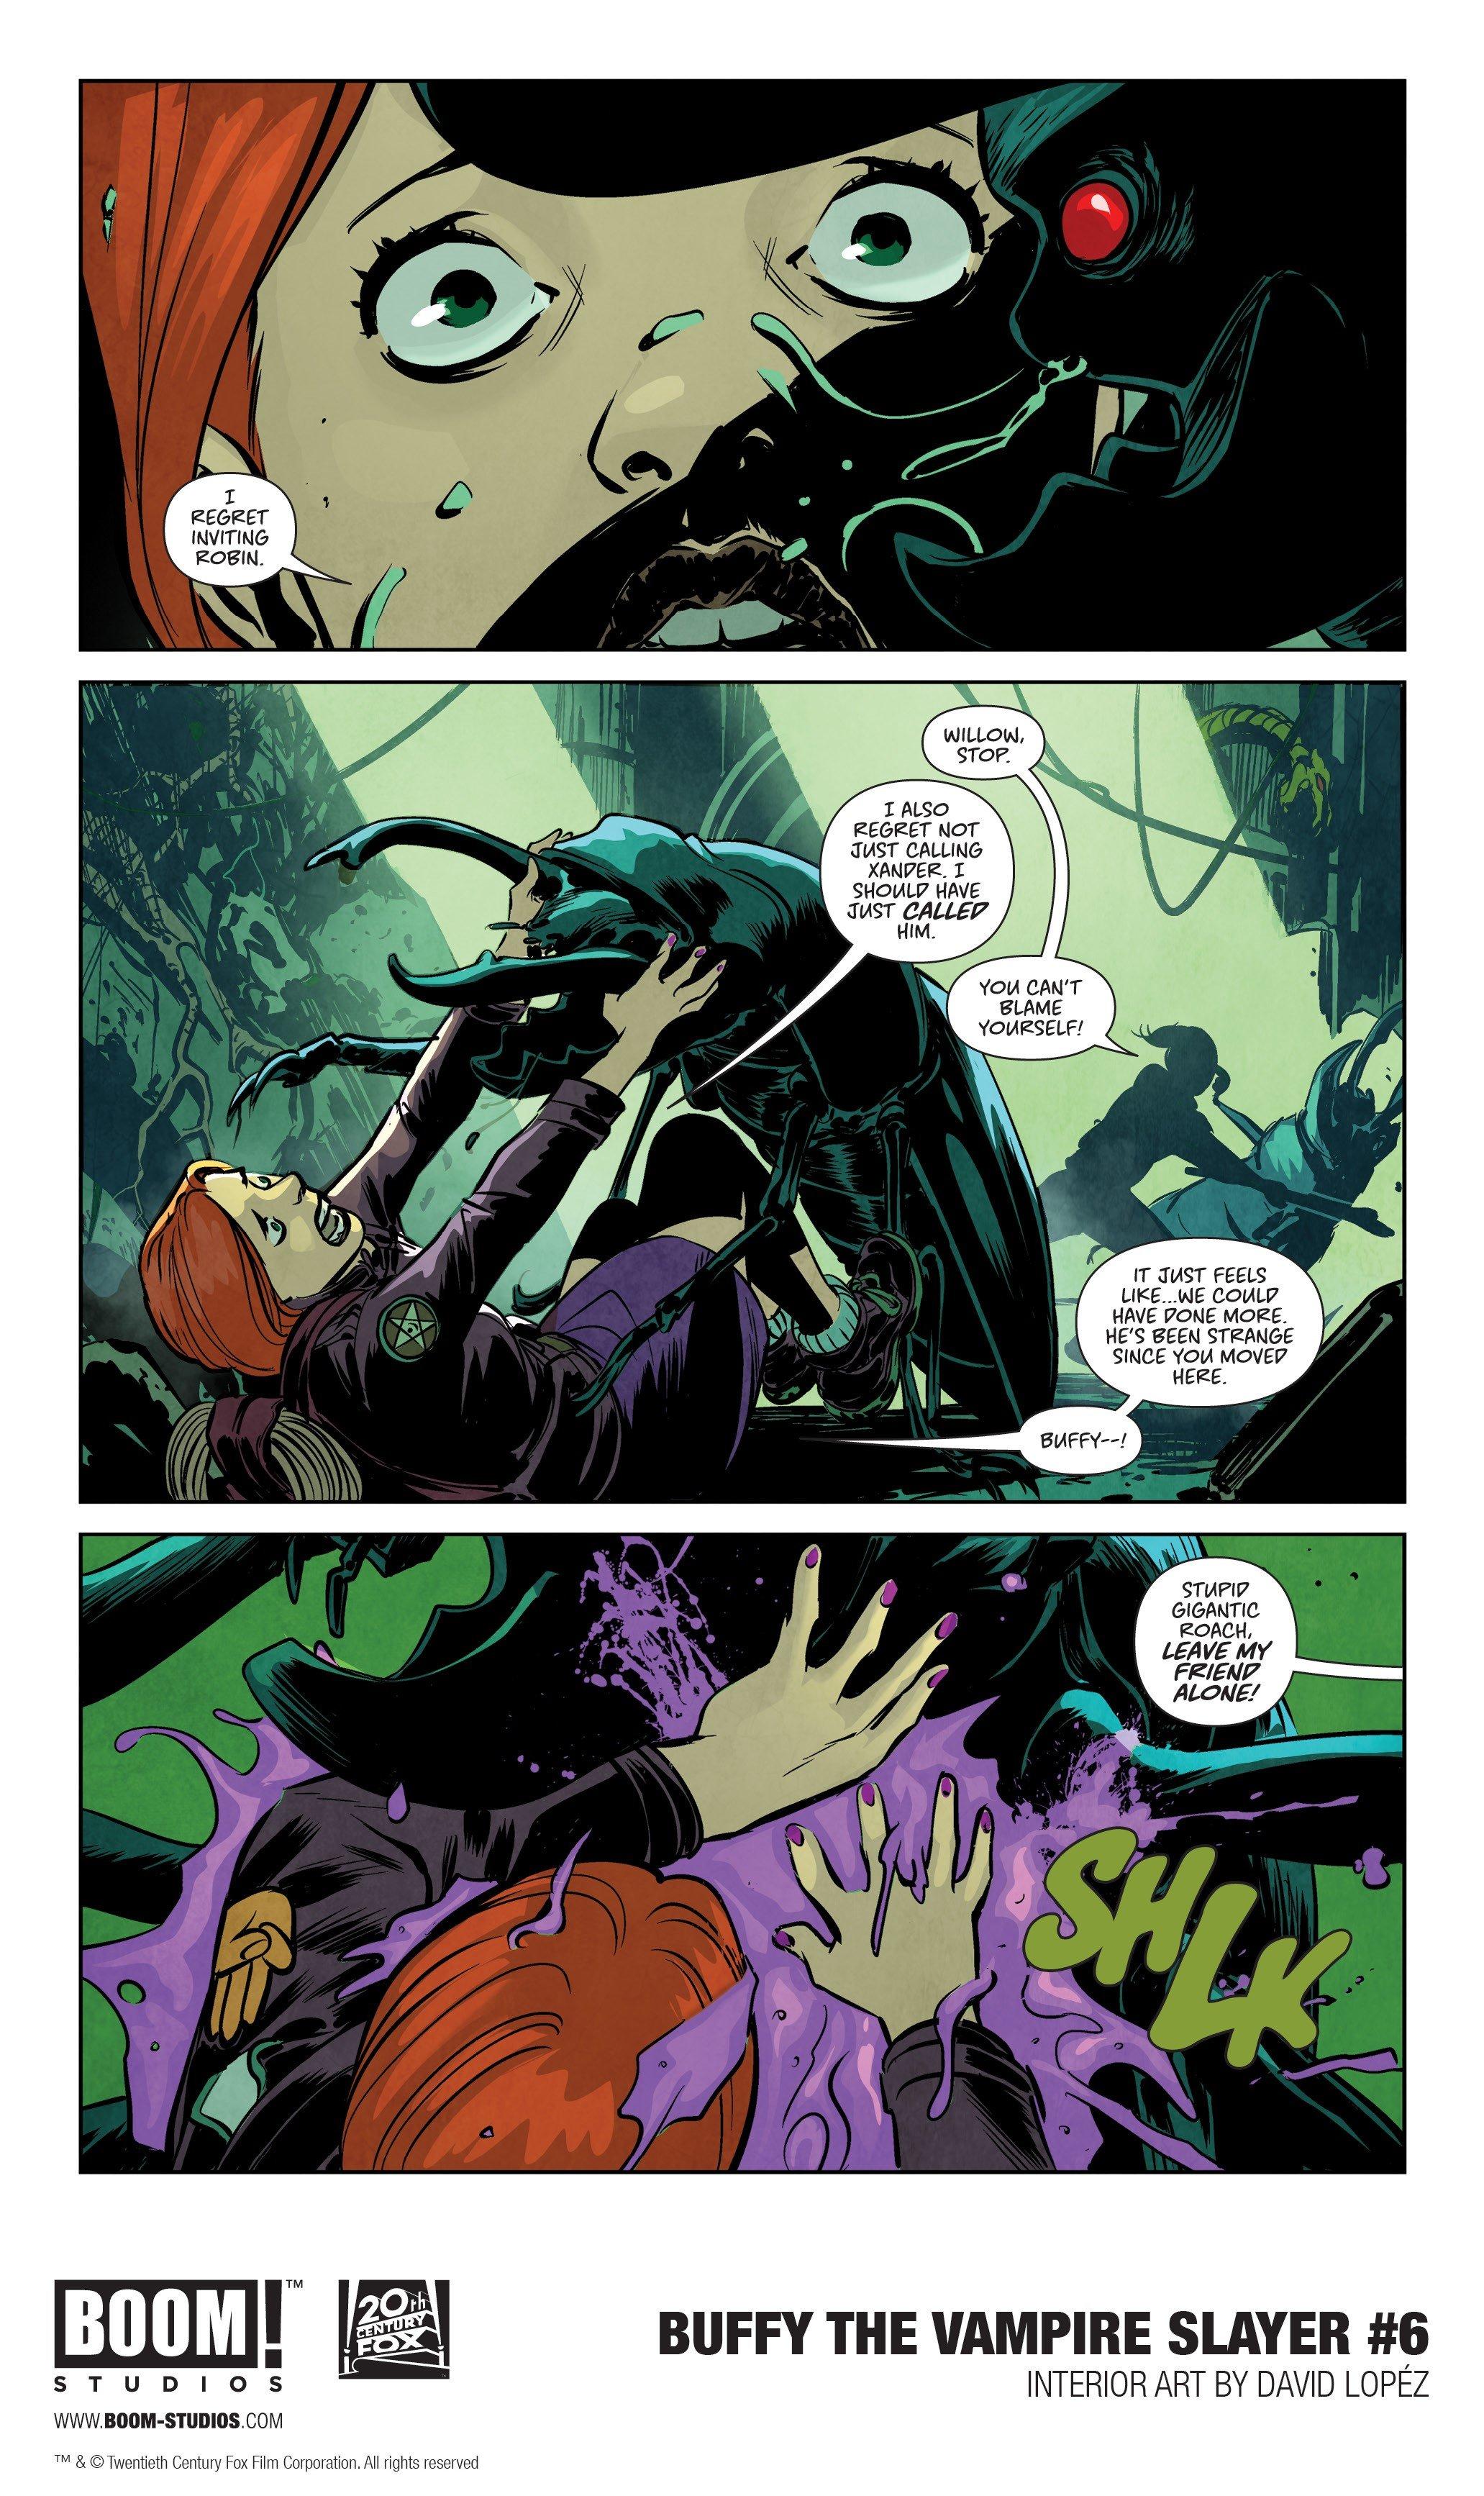 BUFFY THE VAMPIRE SLAYER #6